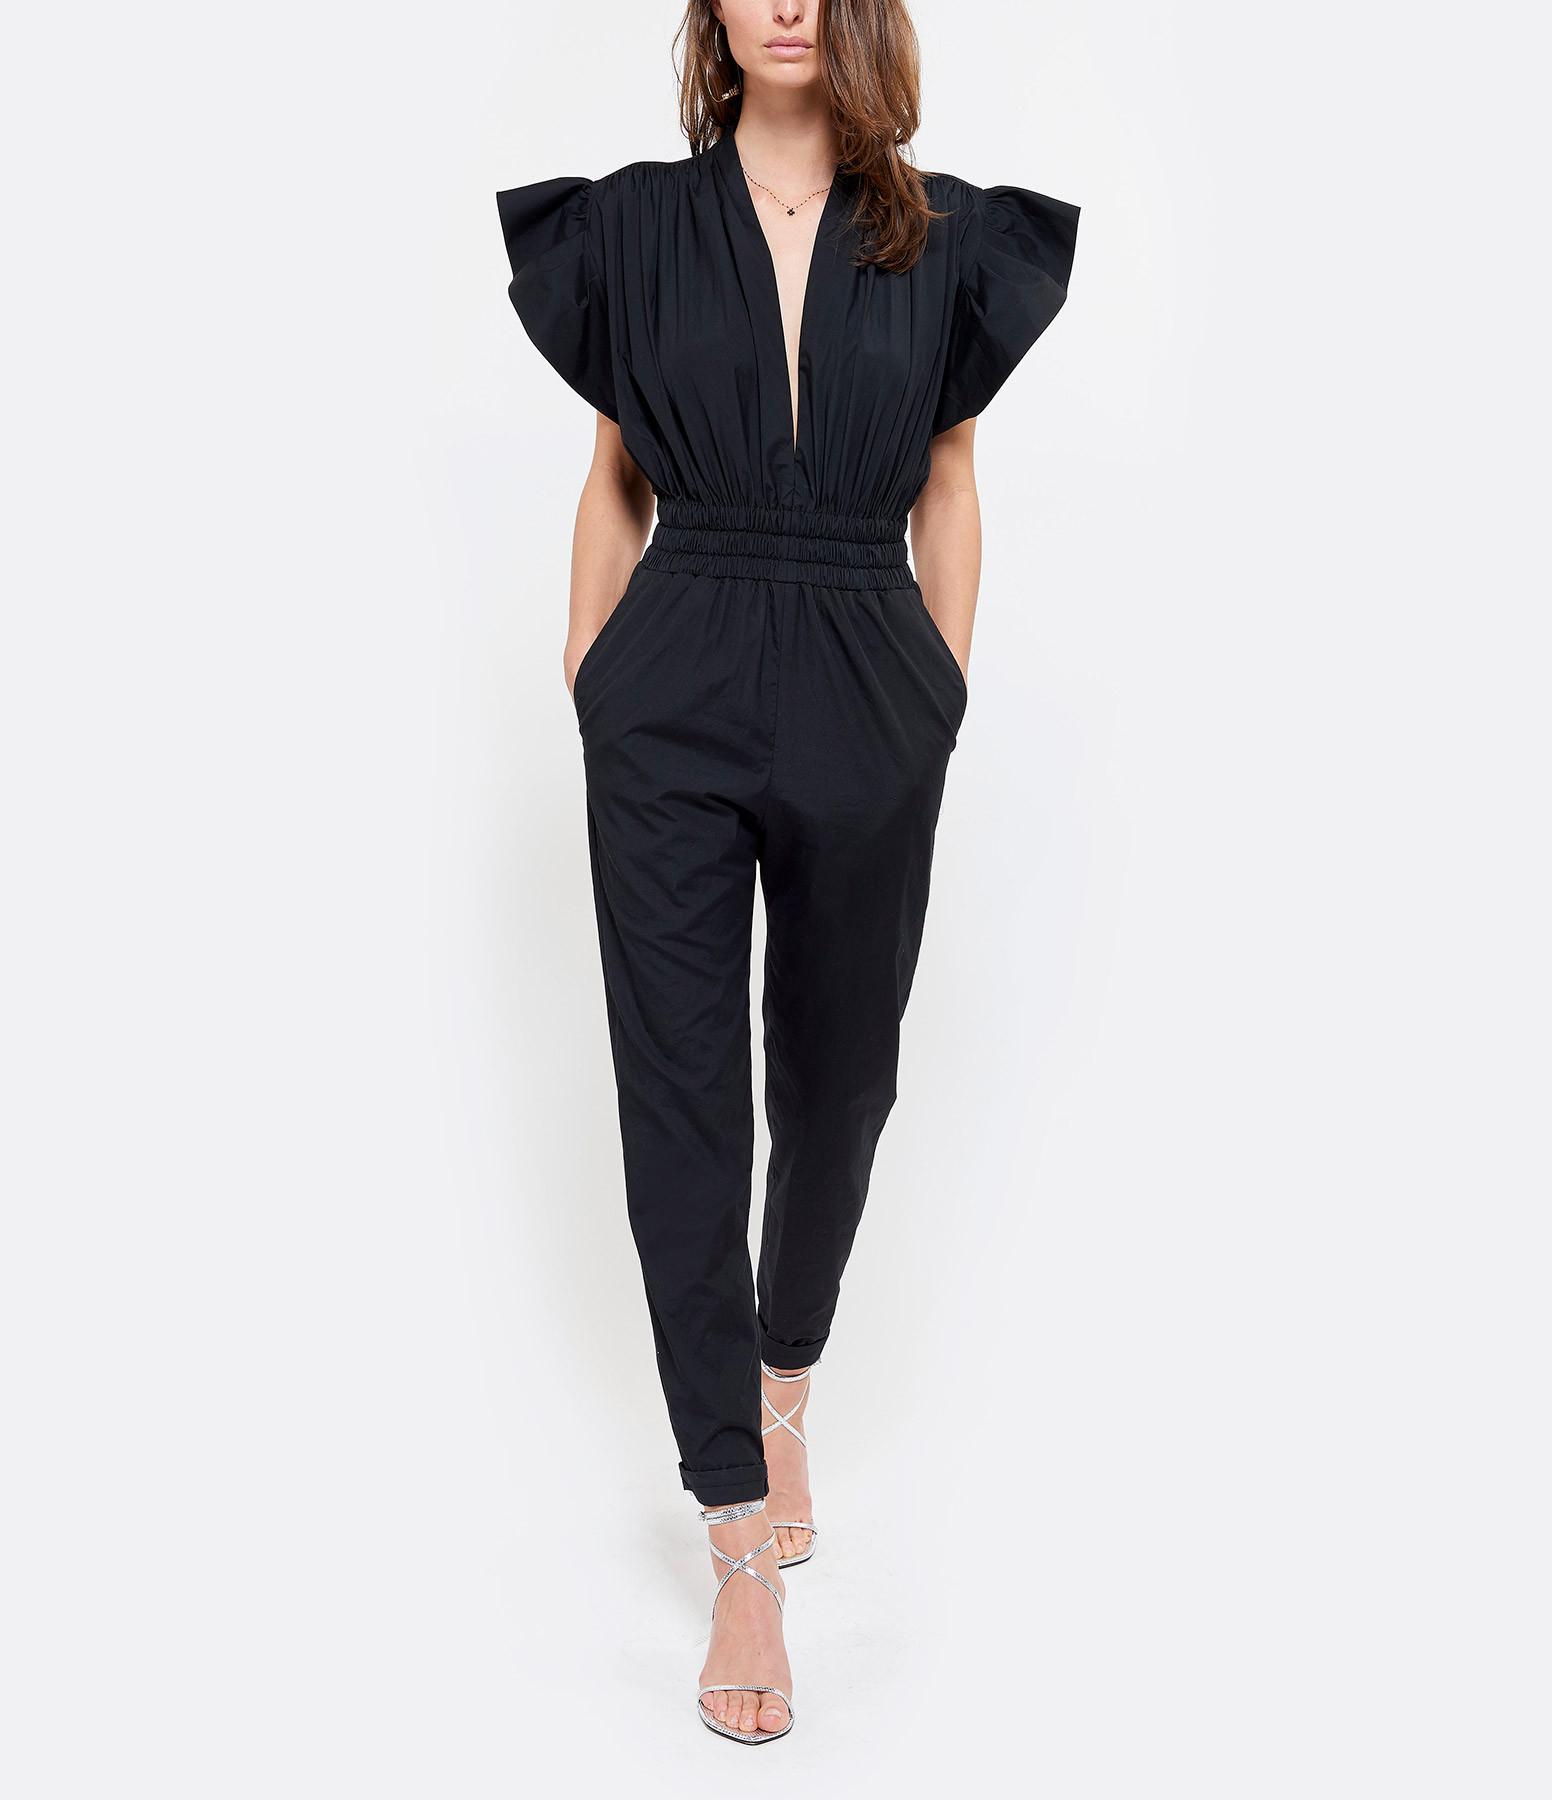 IRO - Combinaison Pleona Coton Noir